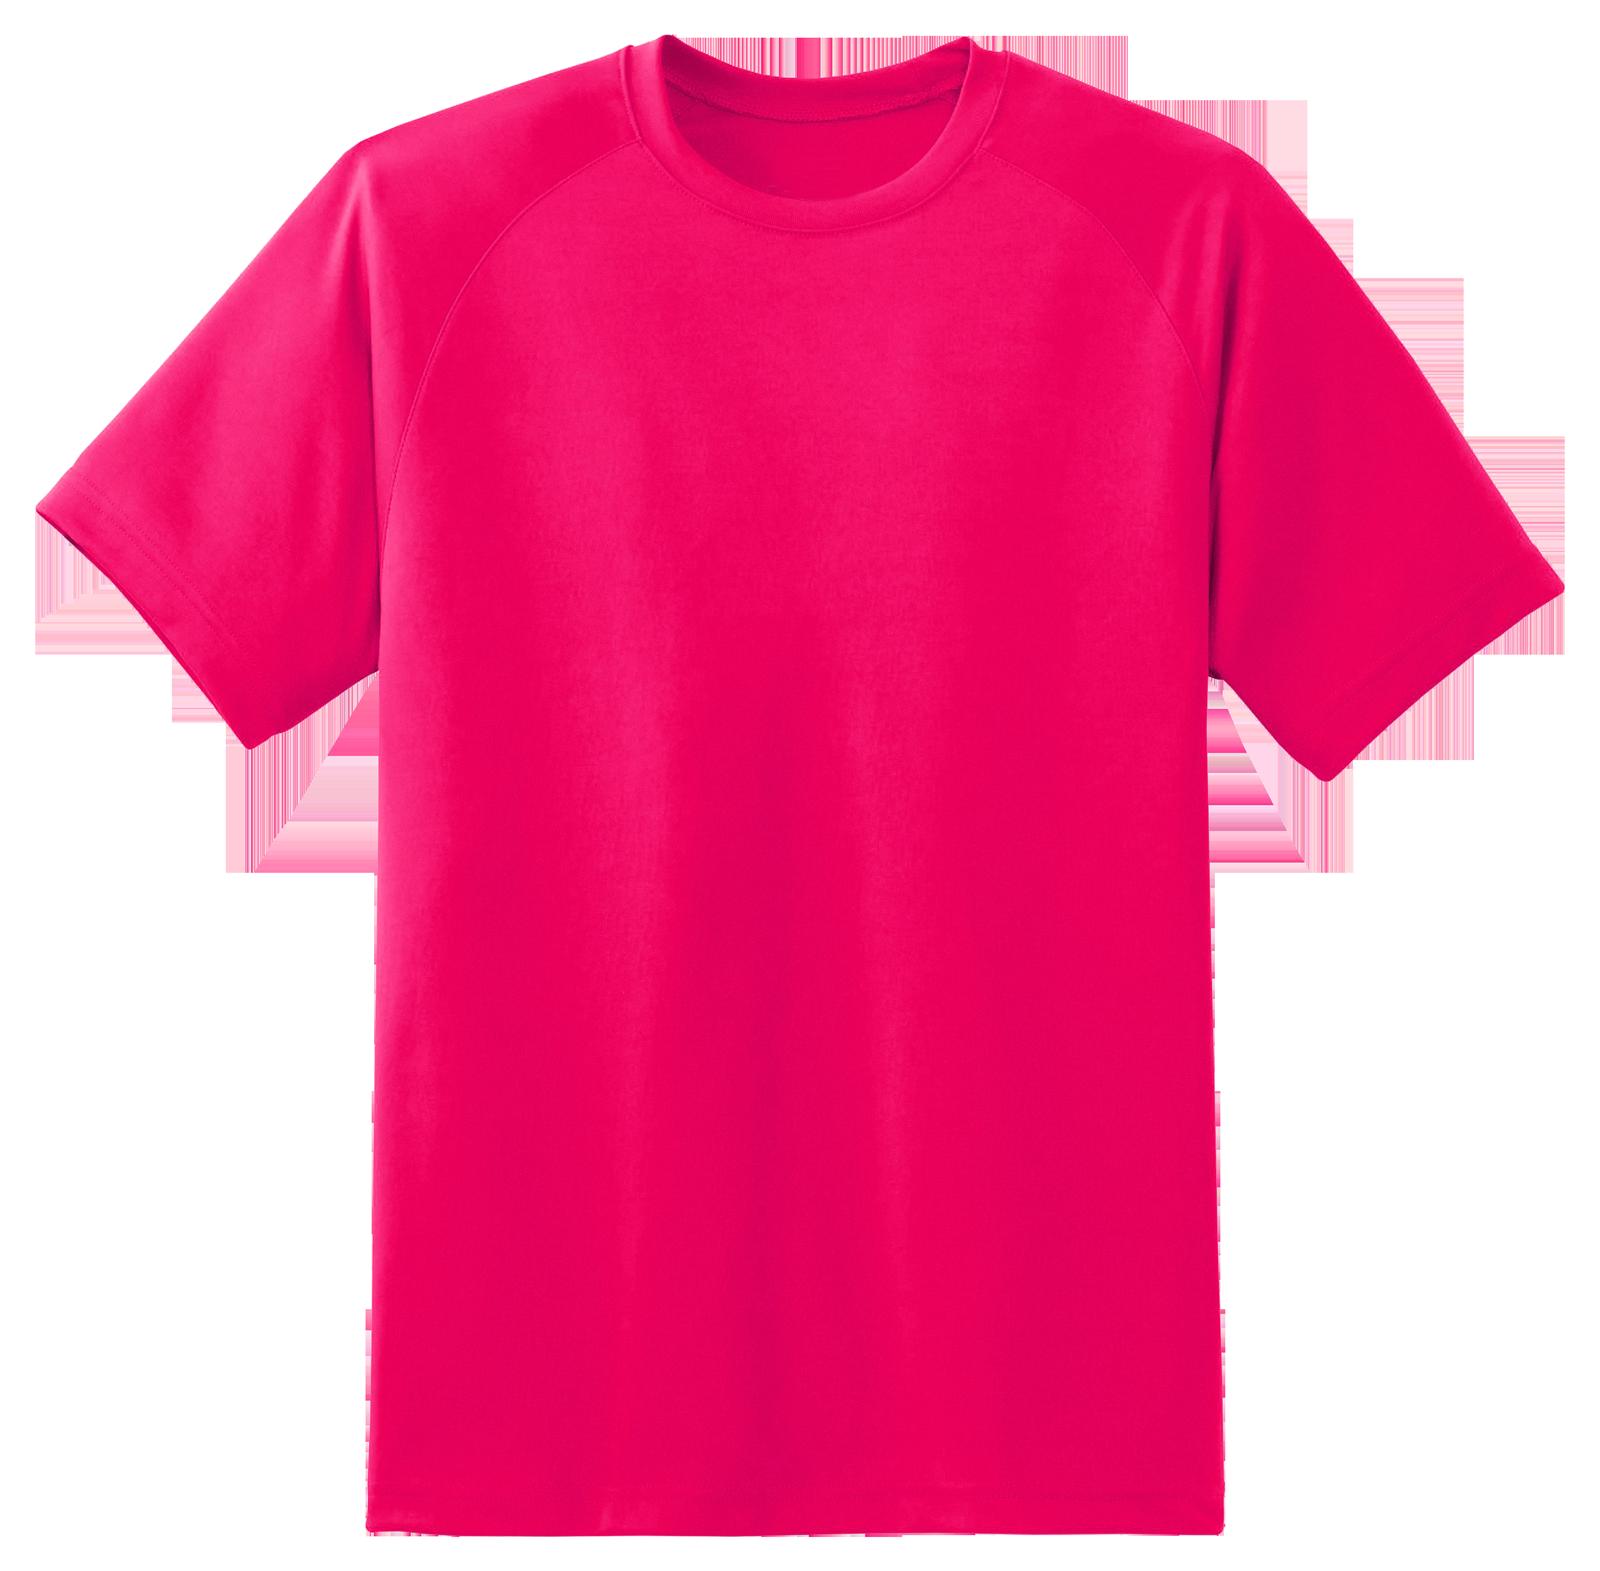 T Shirt PNG Image.